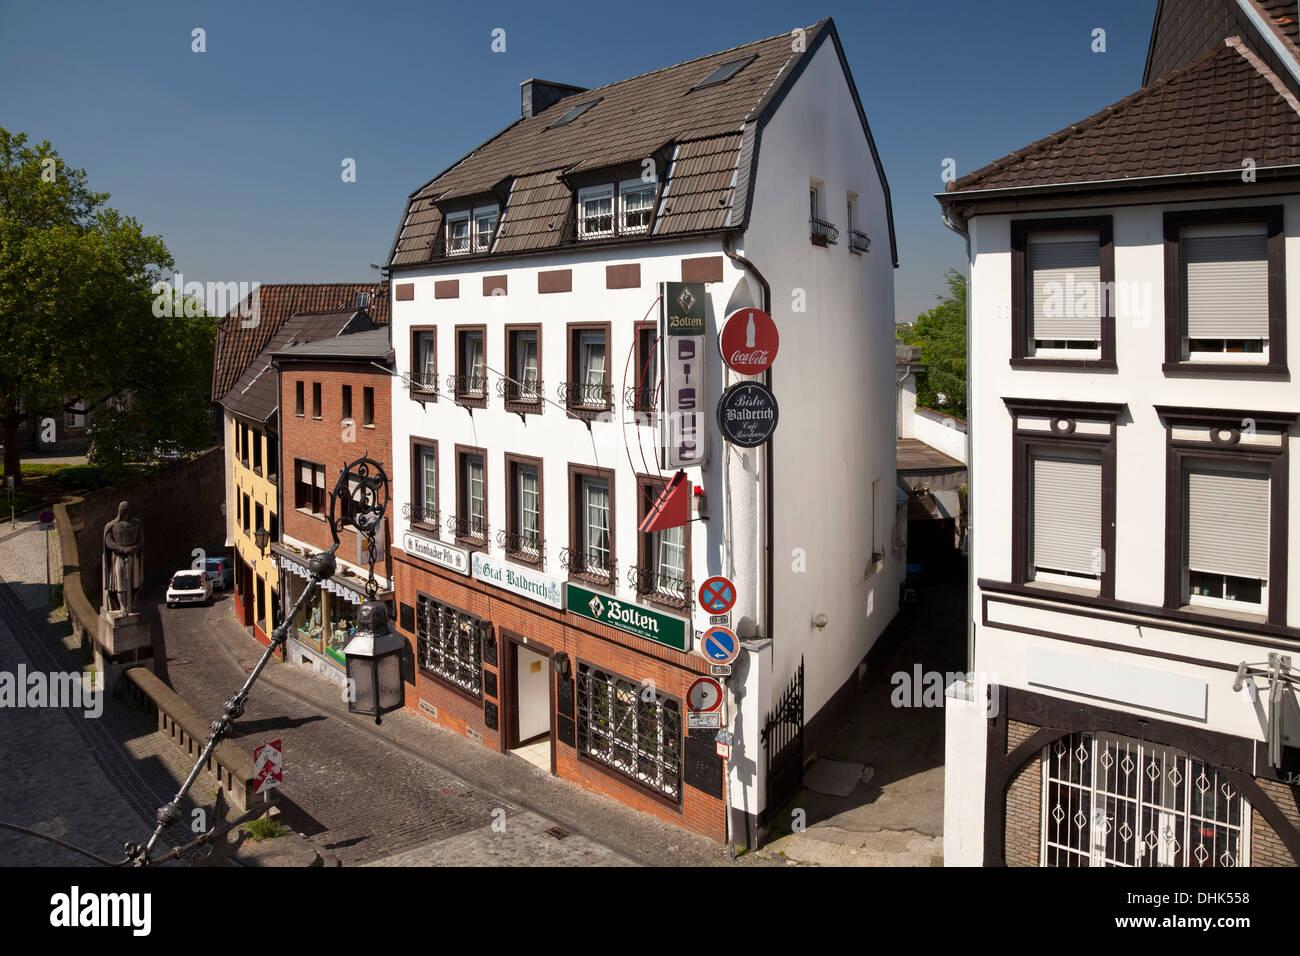 Germany, North Rhine Westphalia, Moenchengladbach, Abteiberg - Stock Image